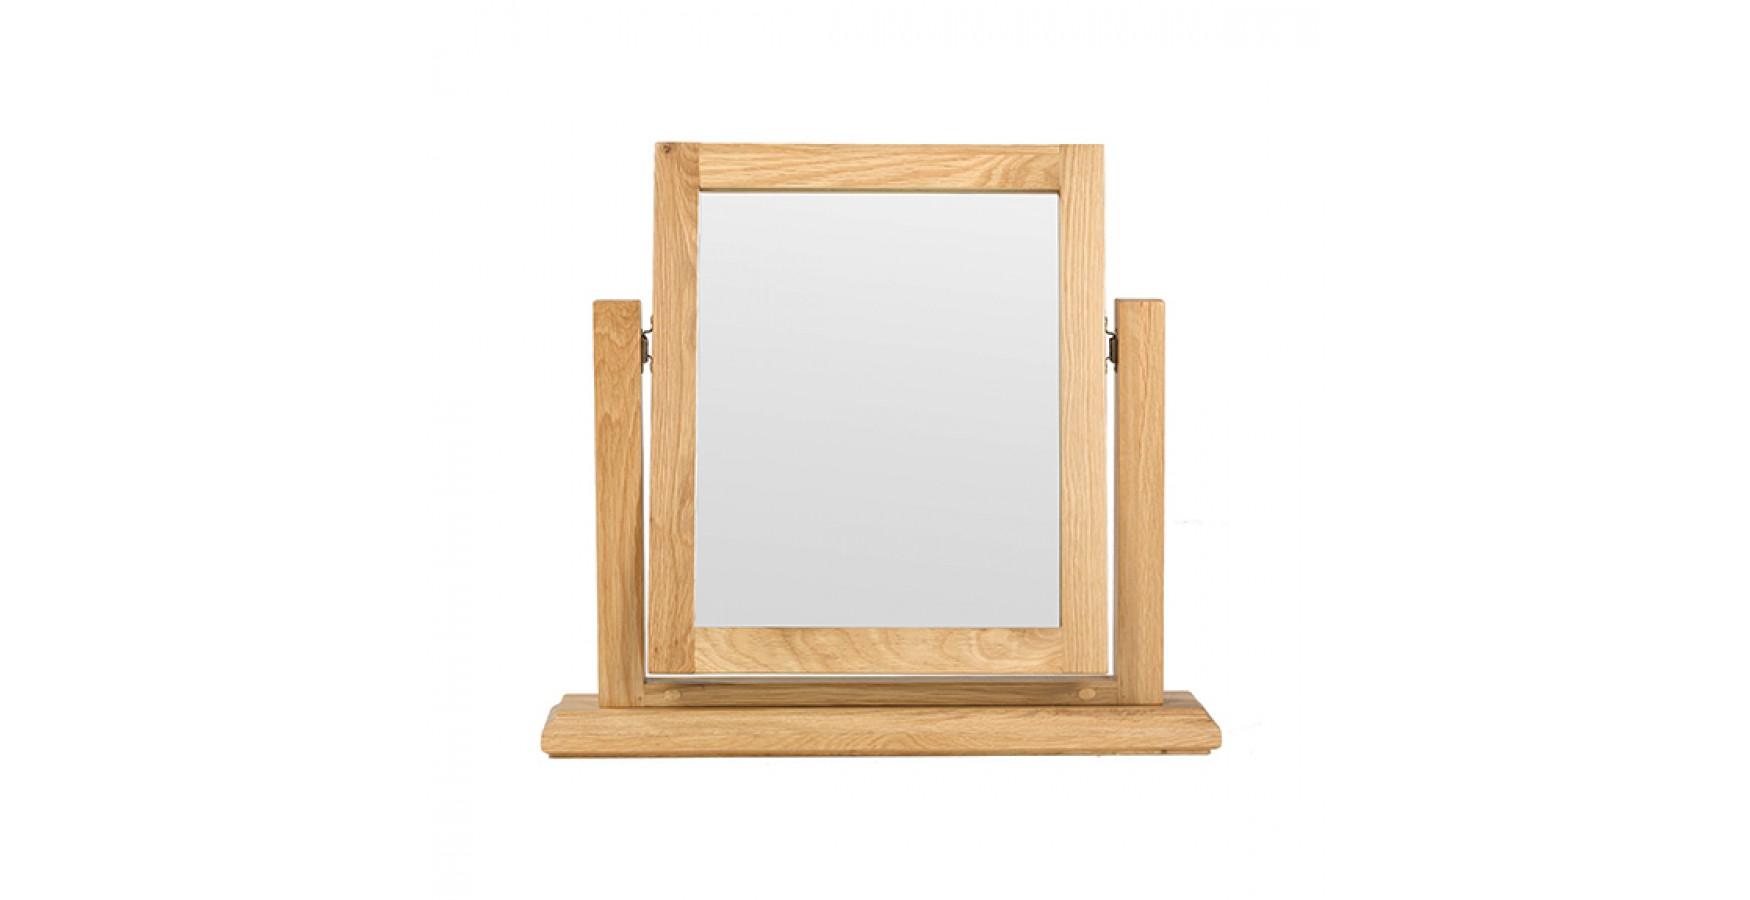 Breton oak dressing table vanity mirror lifestyle for Vanity dressing table with mirror